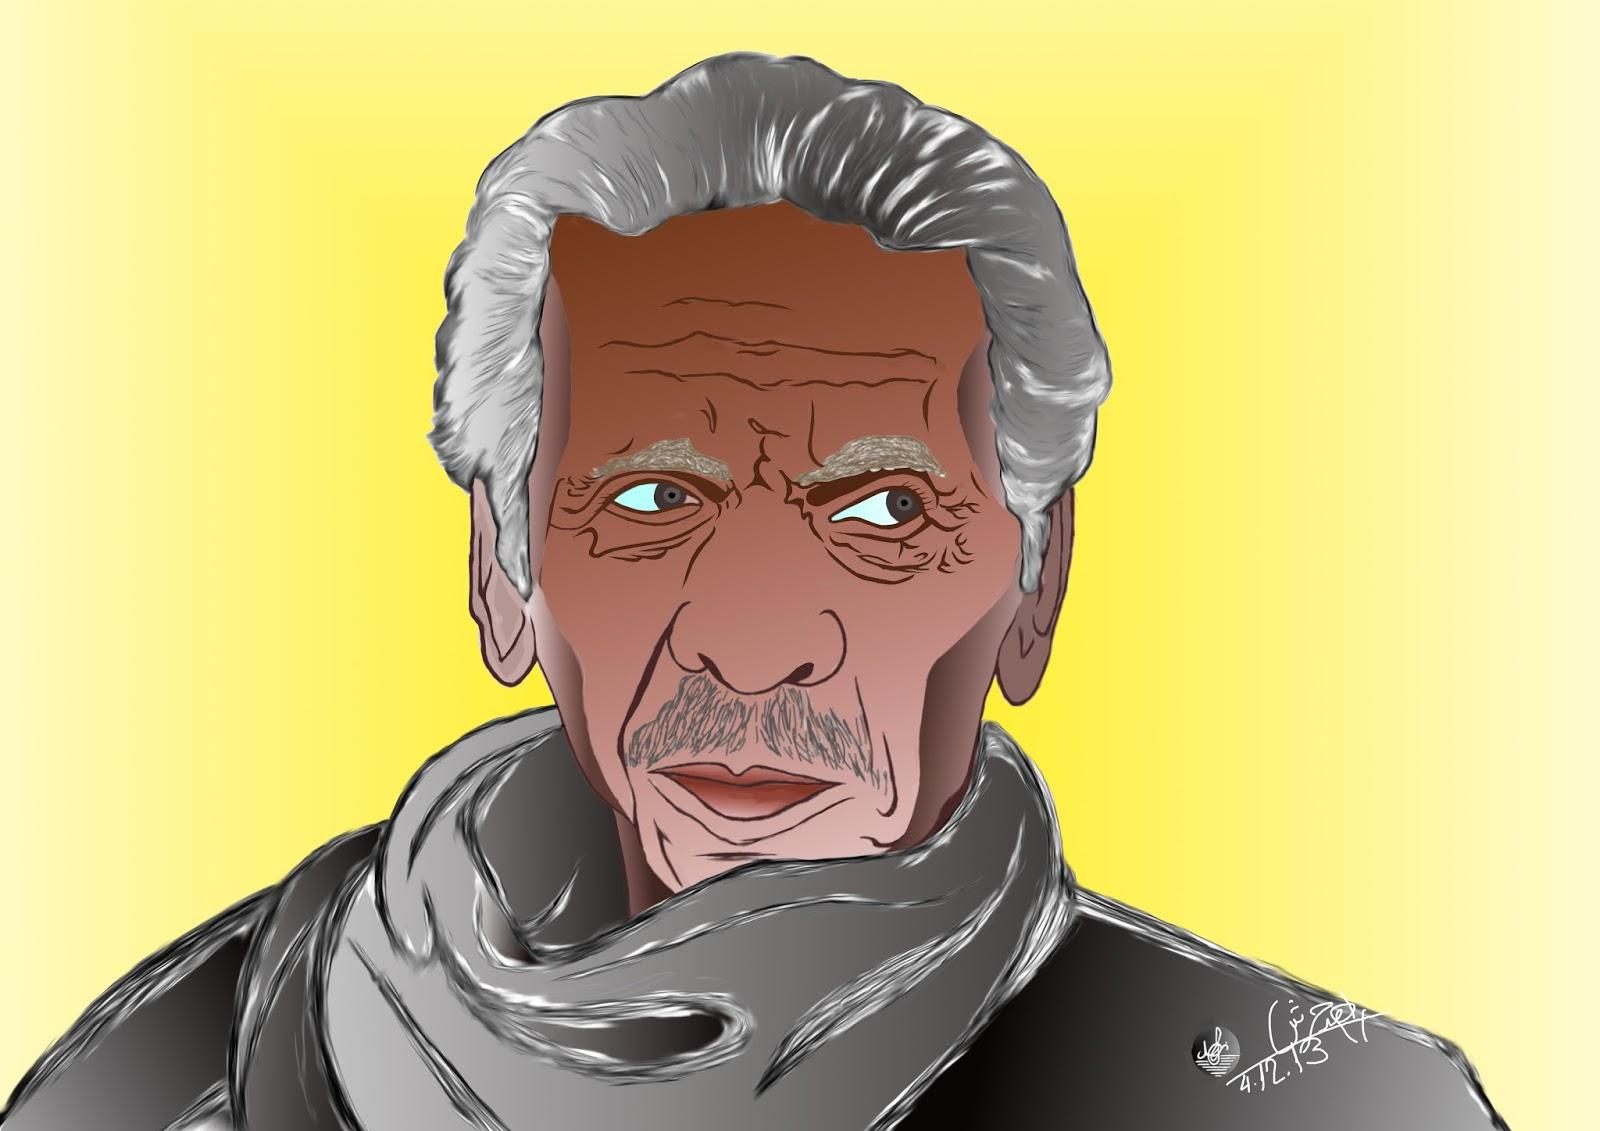 a91f3a43b Slatni Ghifari: اروع القصائد لاحمد فؤاد نجم